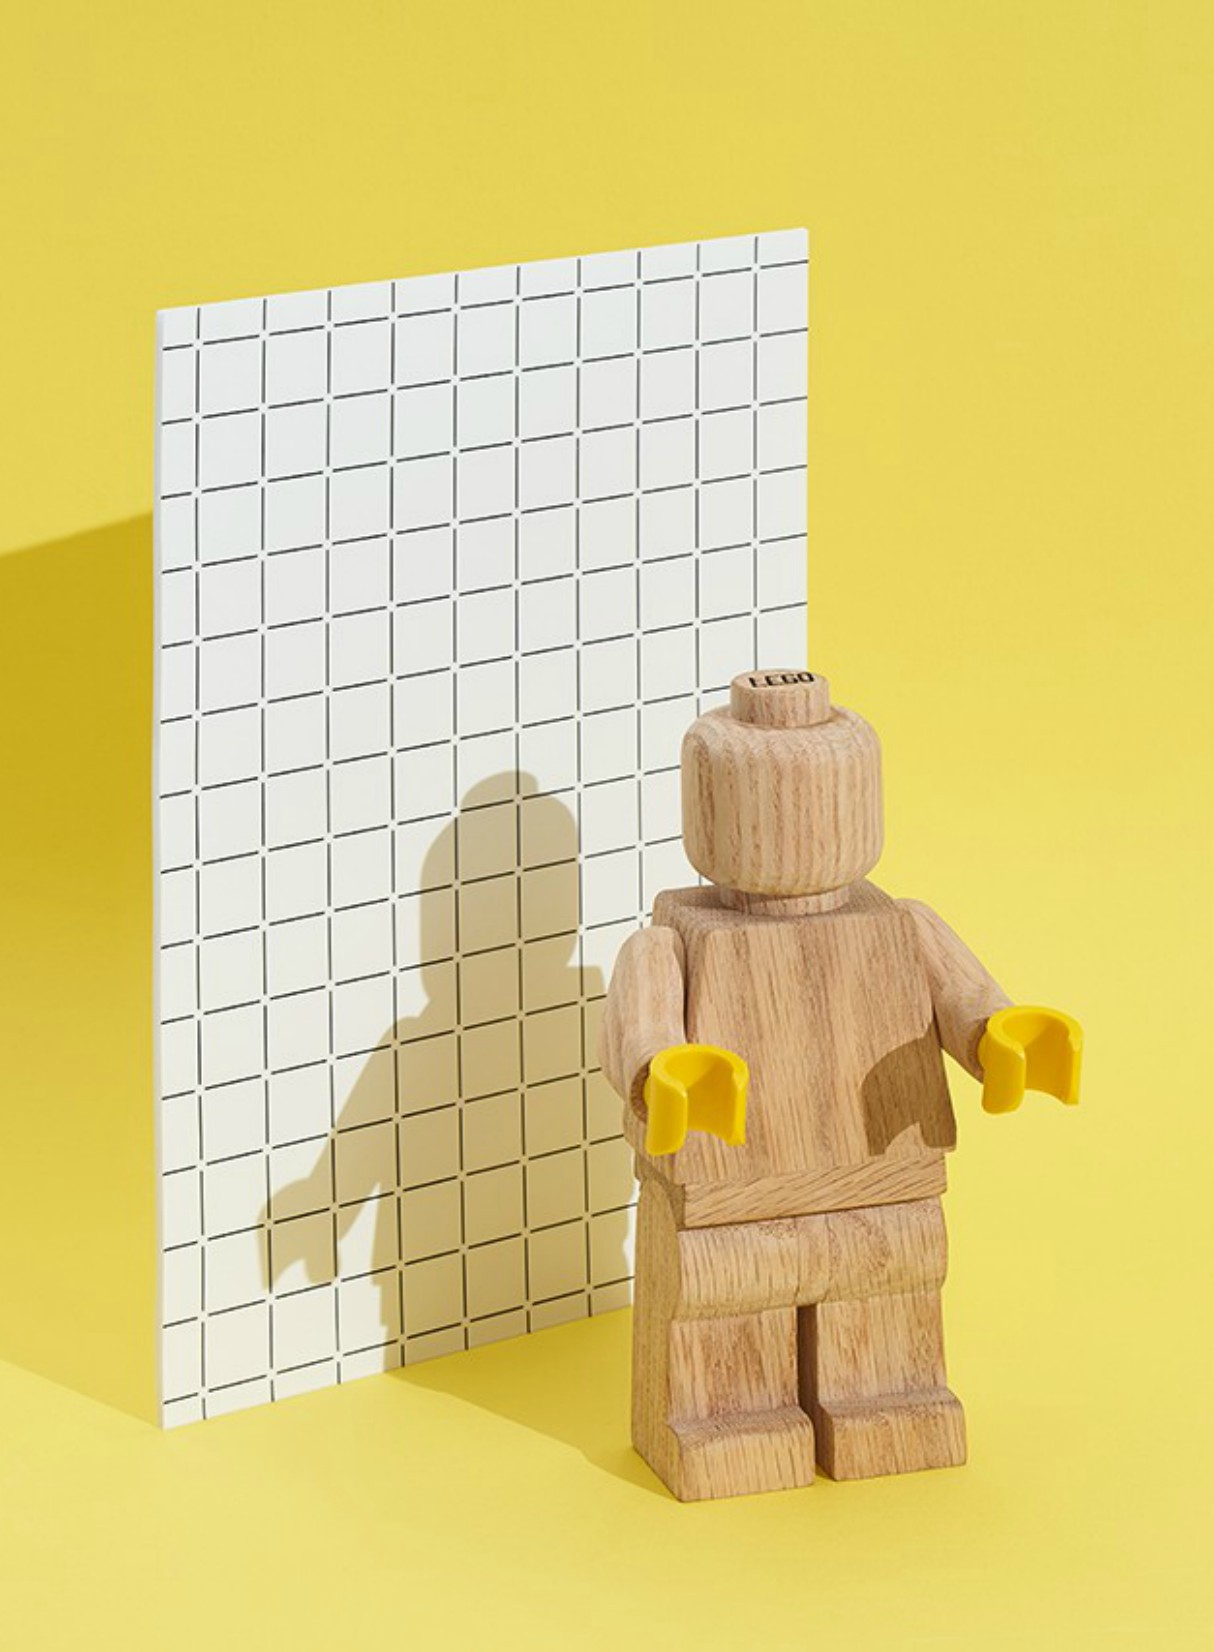 lego-originals-wooden-minifigures-3